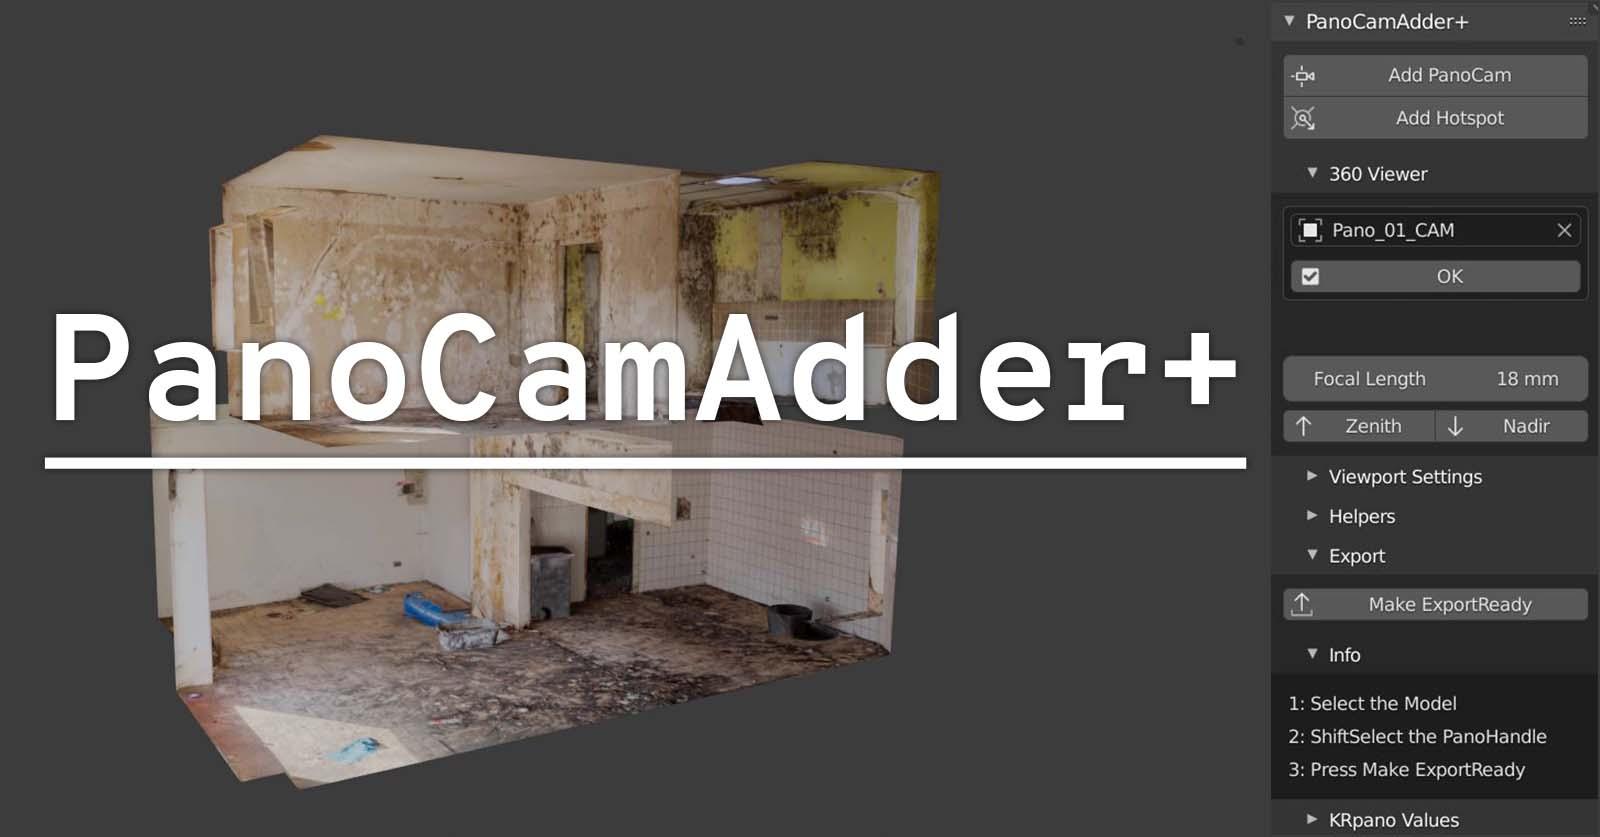 PanoCamAdder+